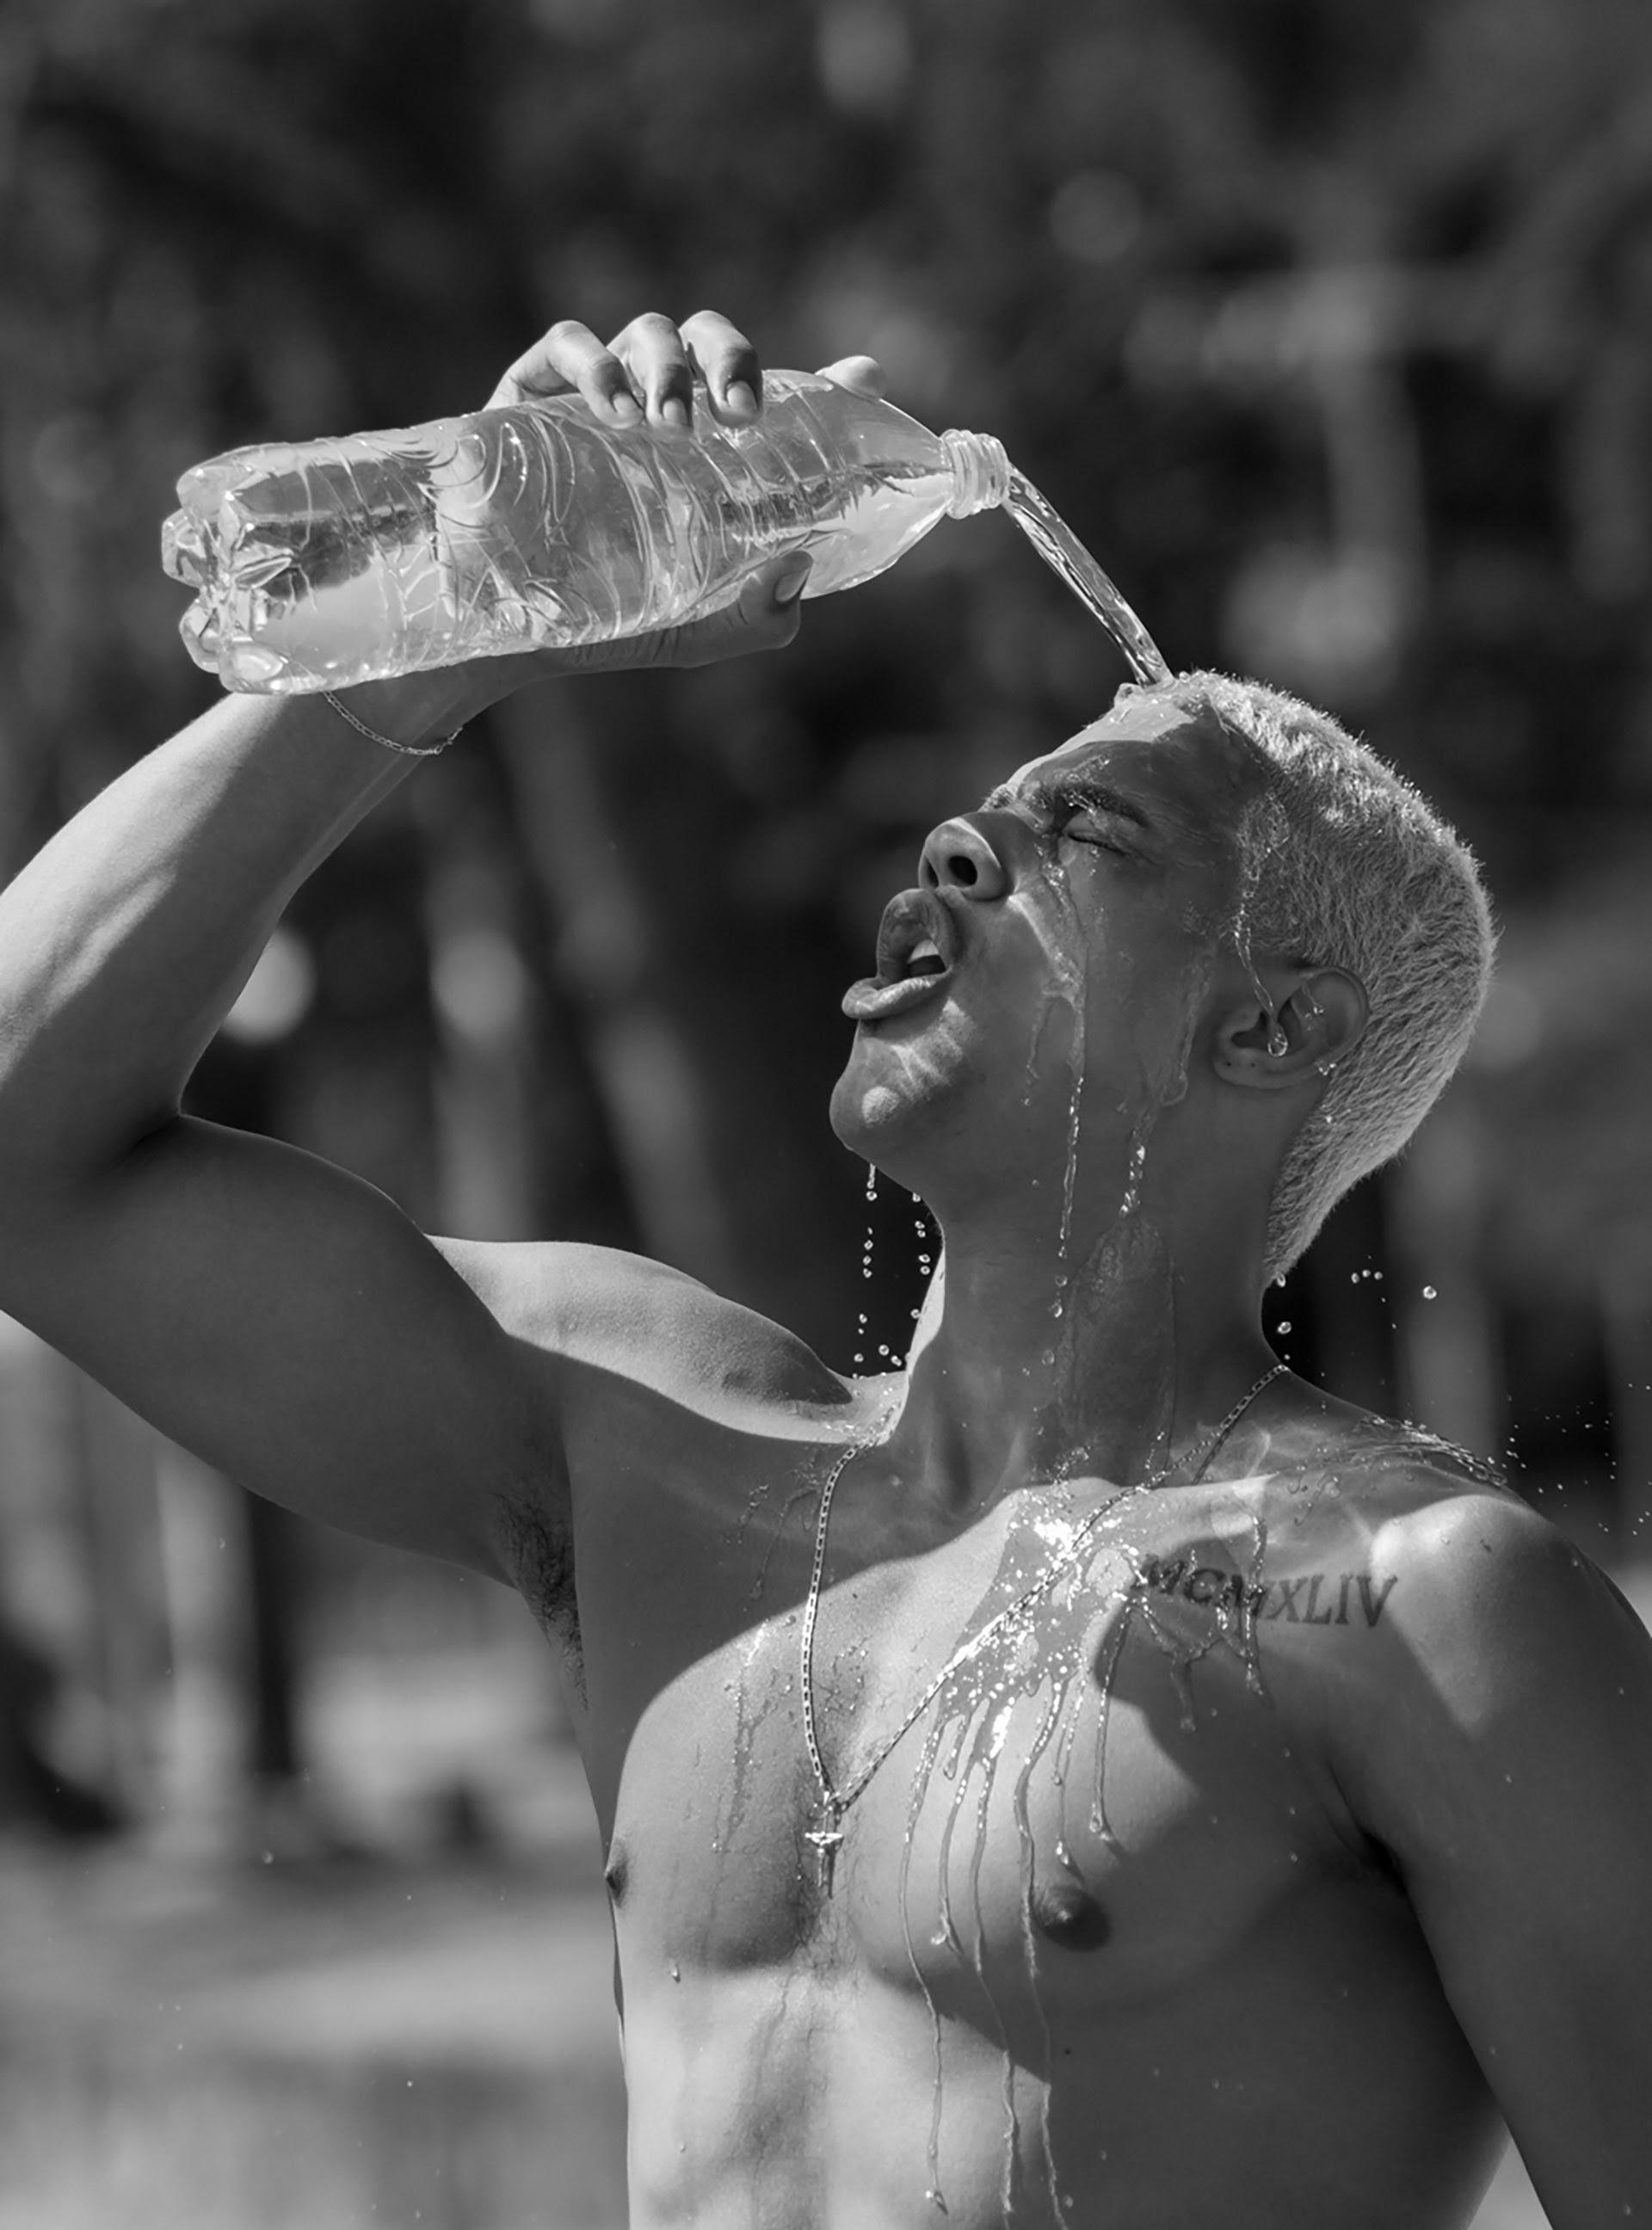 WaterFaLL, by Guilherme Cirino ft Jonas Barros for Made in Brazil Magazine.